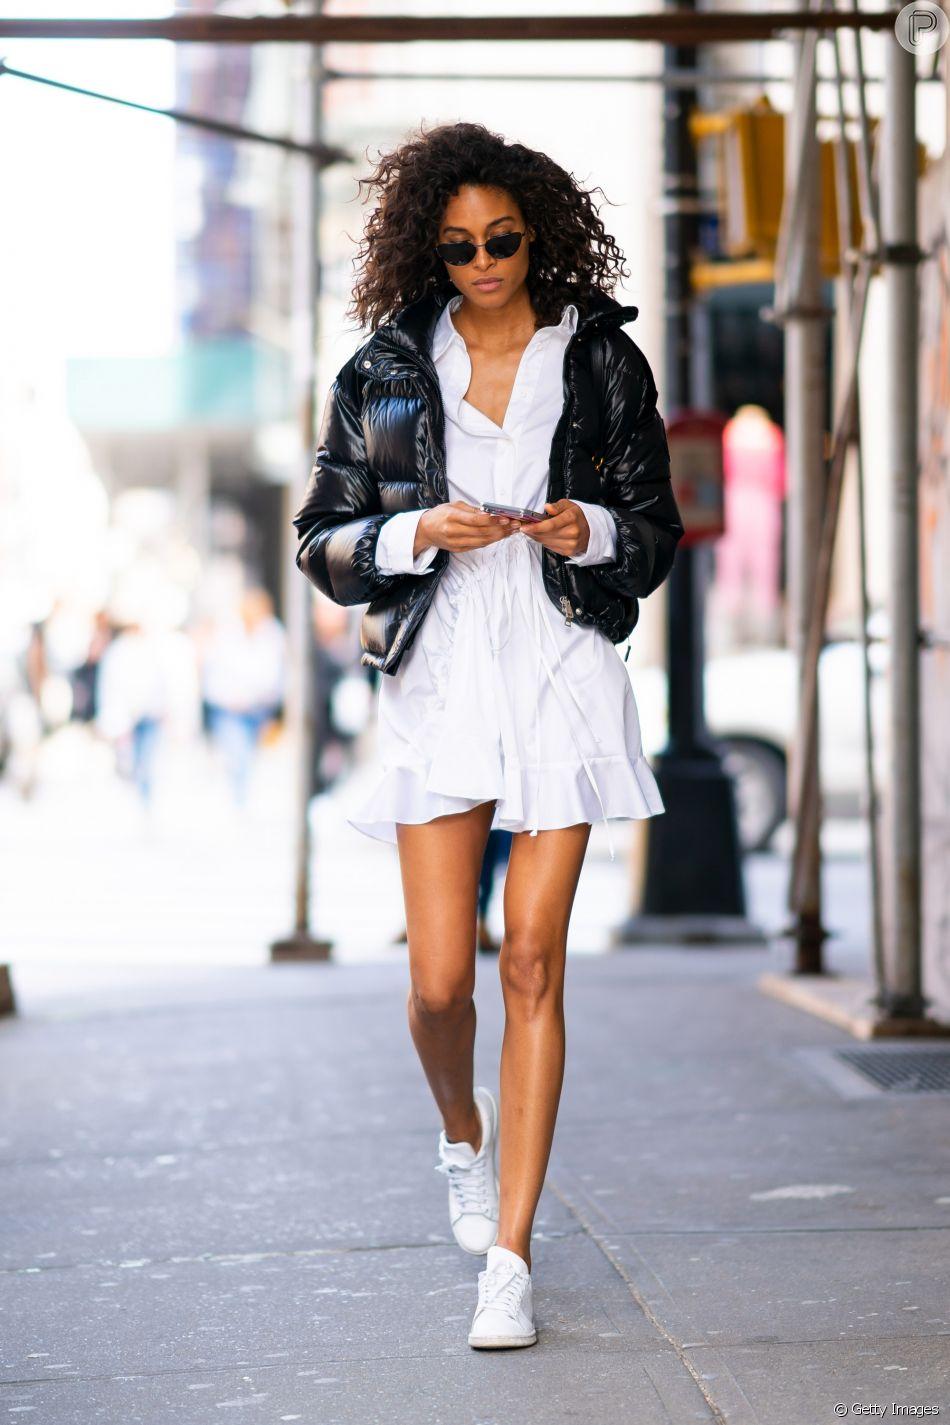 O casaco doudone, ou puffer jacket, é confortável e cheio de estilo para os looks de inverno